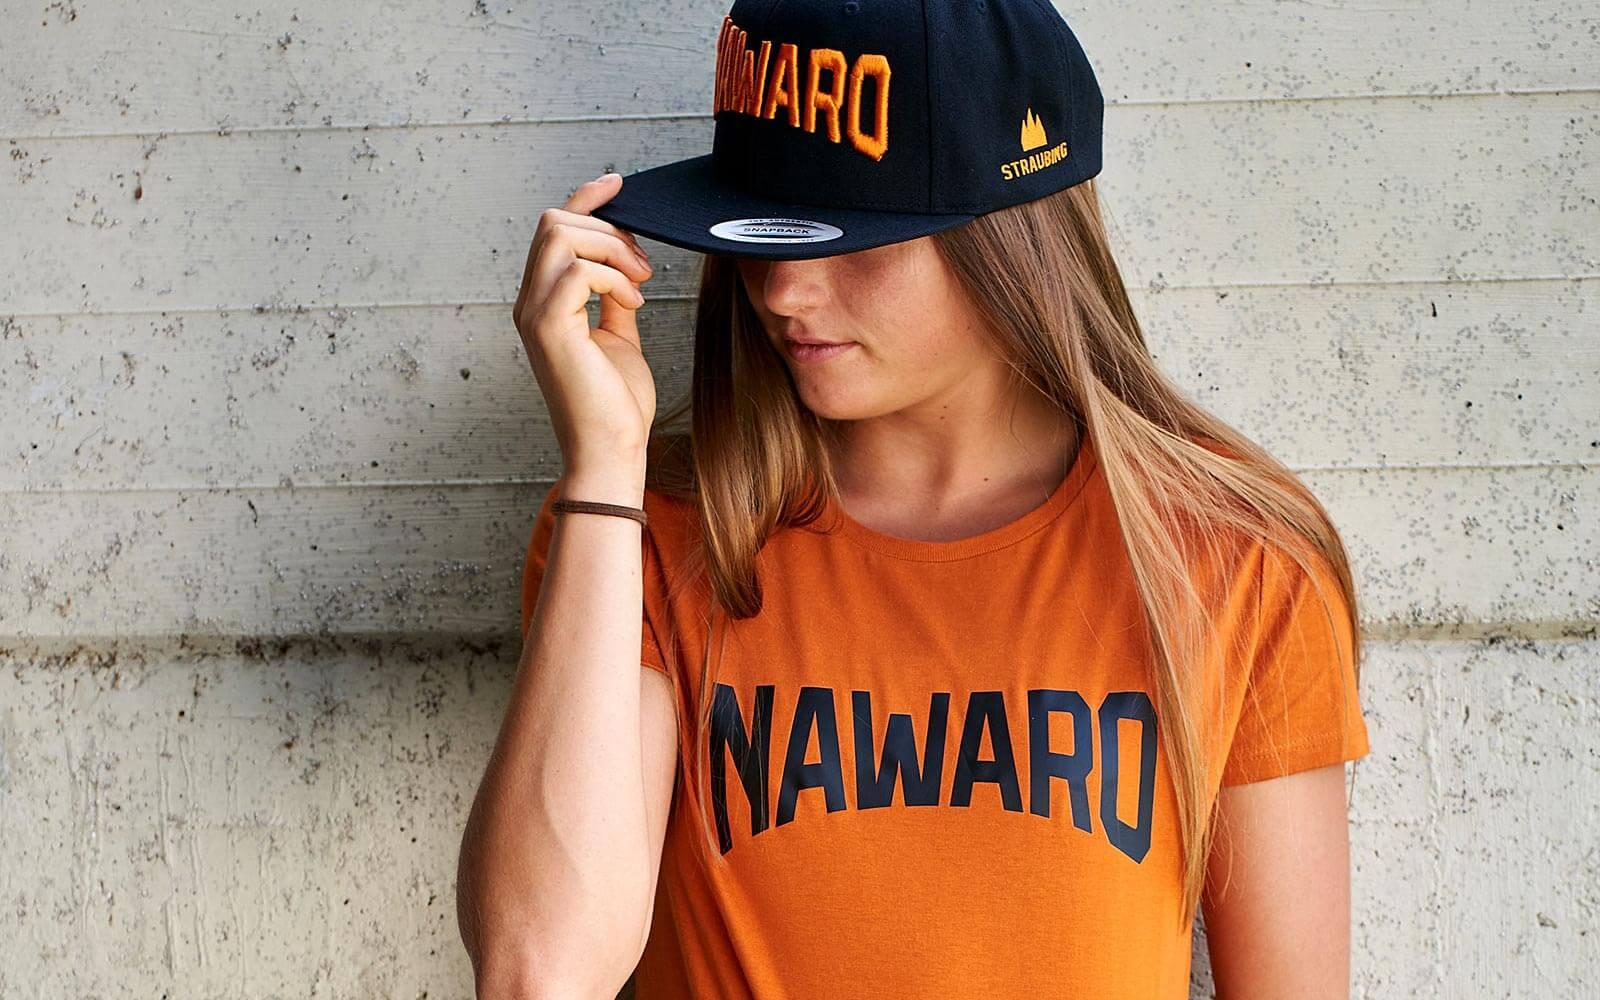 NawaRo Straubing – Flexfit-Cap & Shirt (© German Popp)